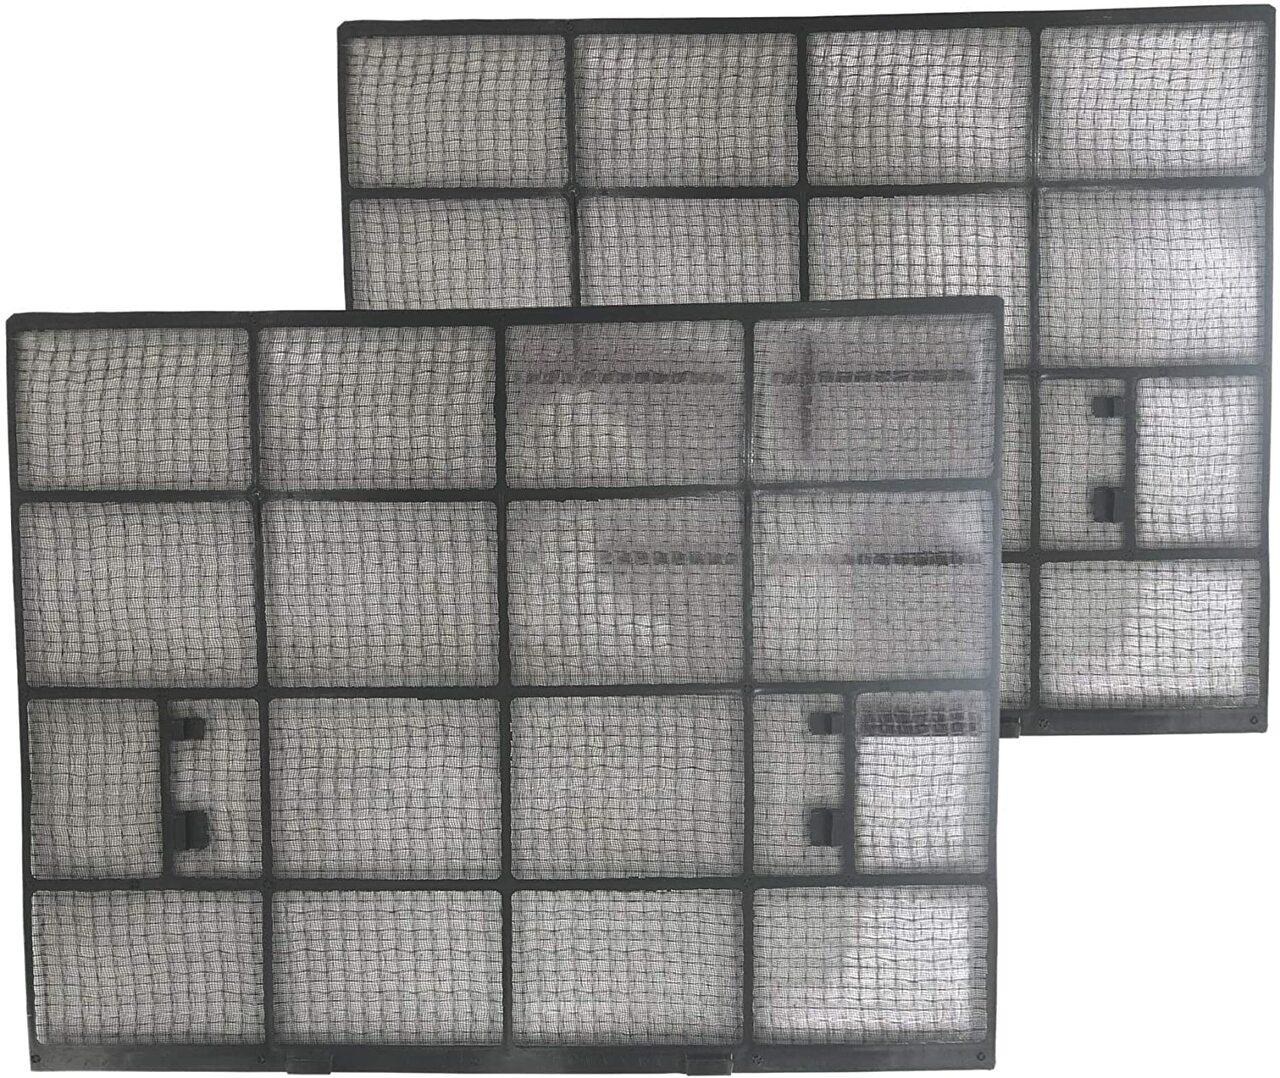 Daikin 1380242 Standard Replacement Air Filters - 2 Pack